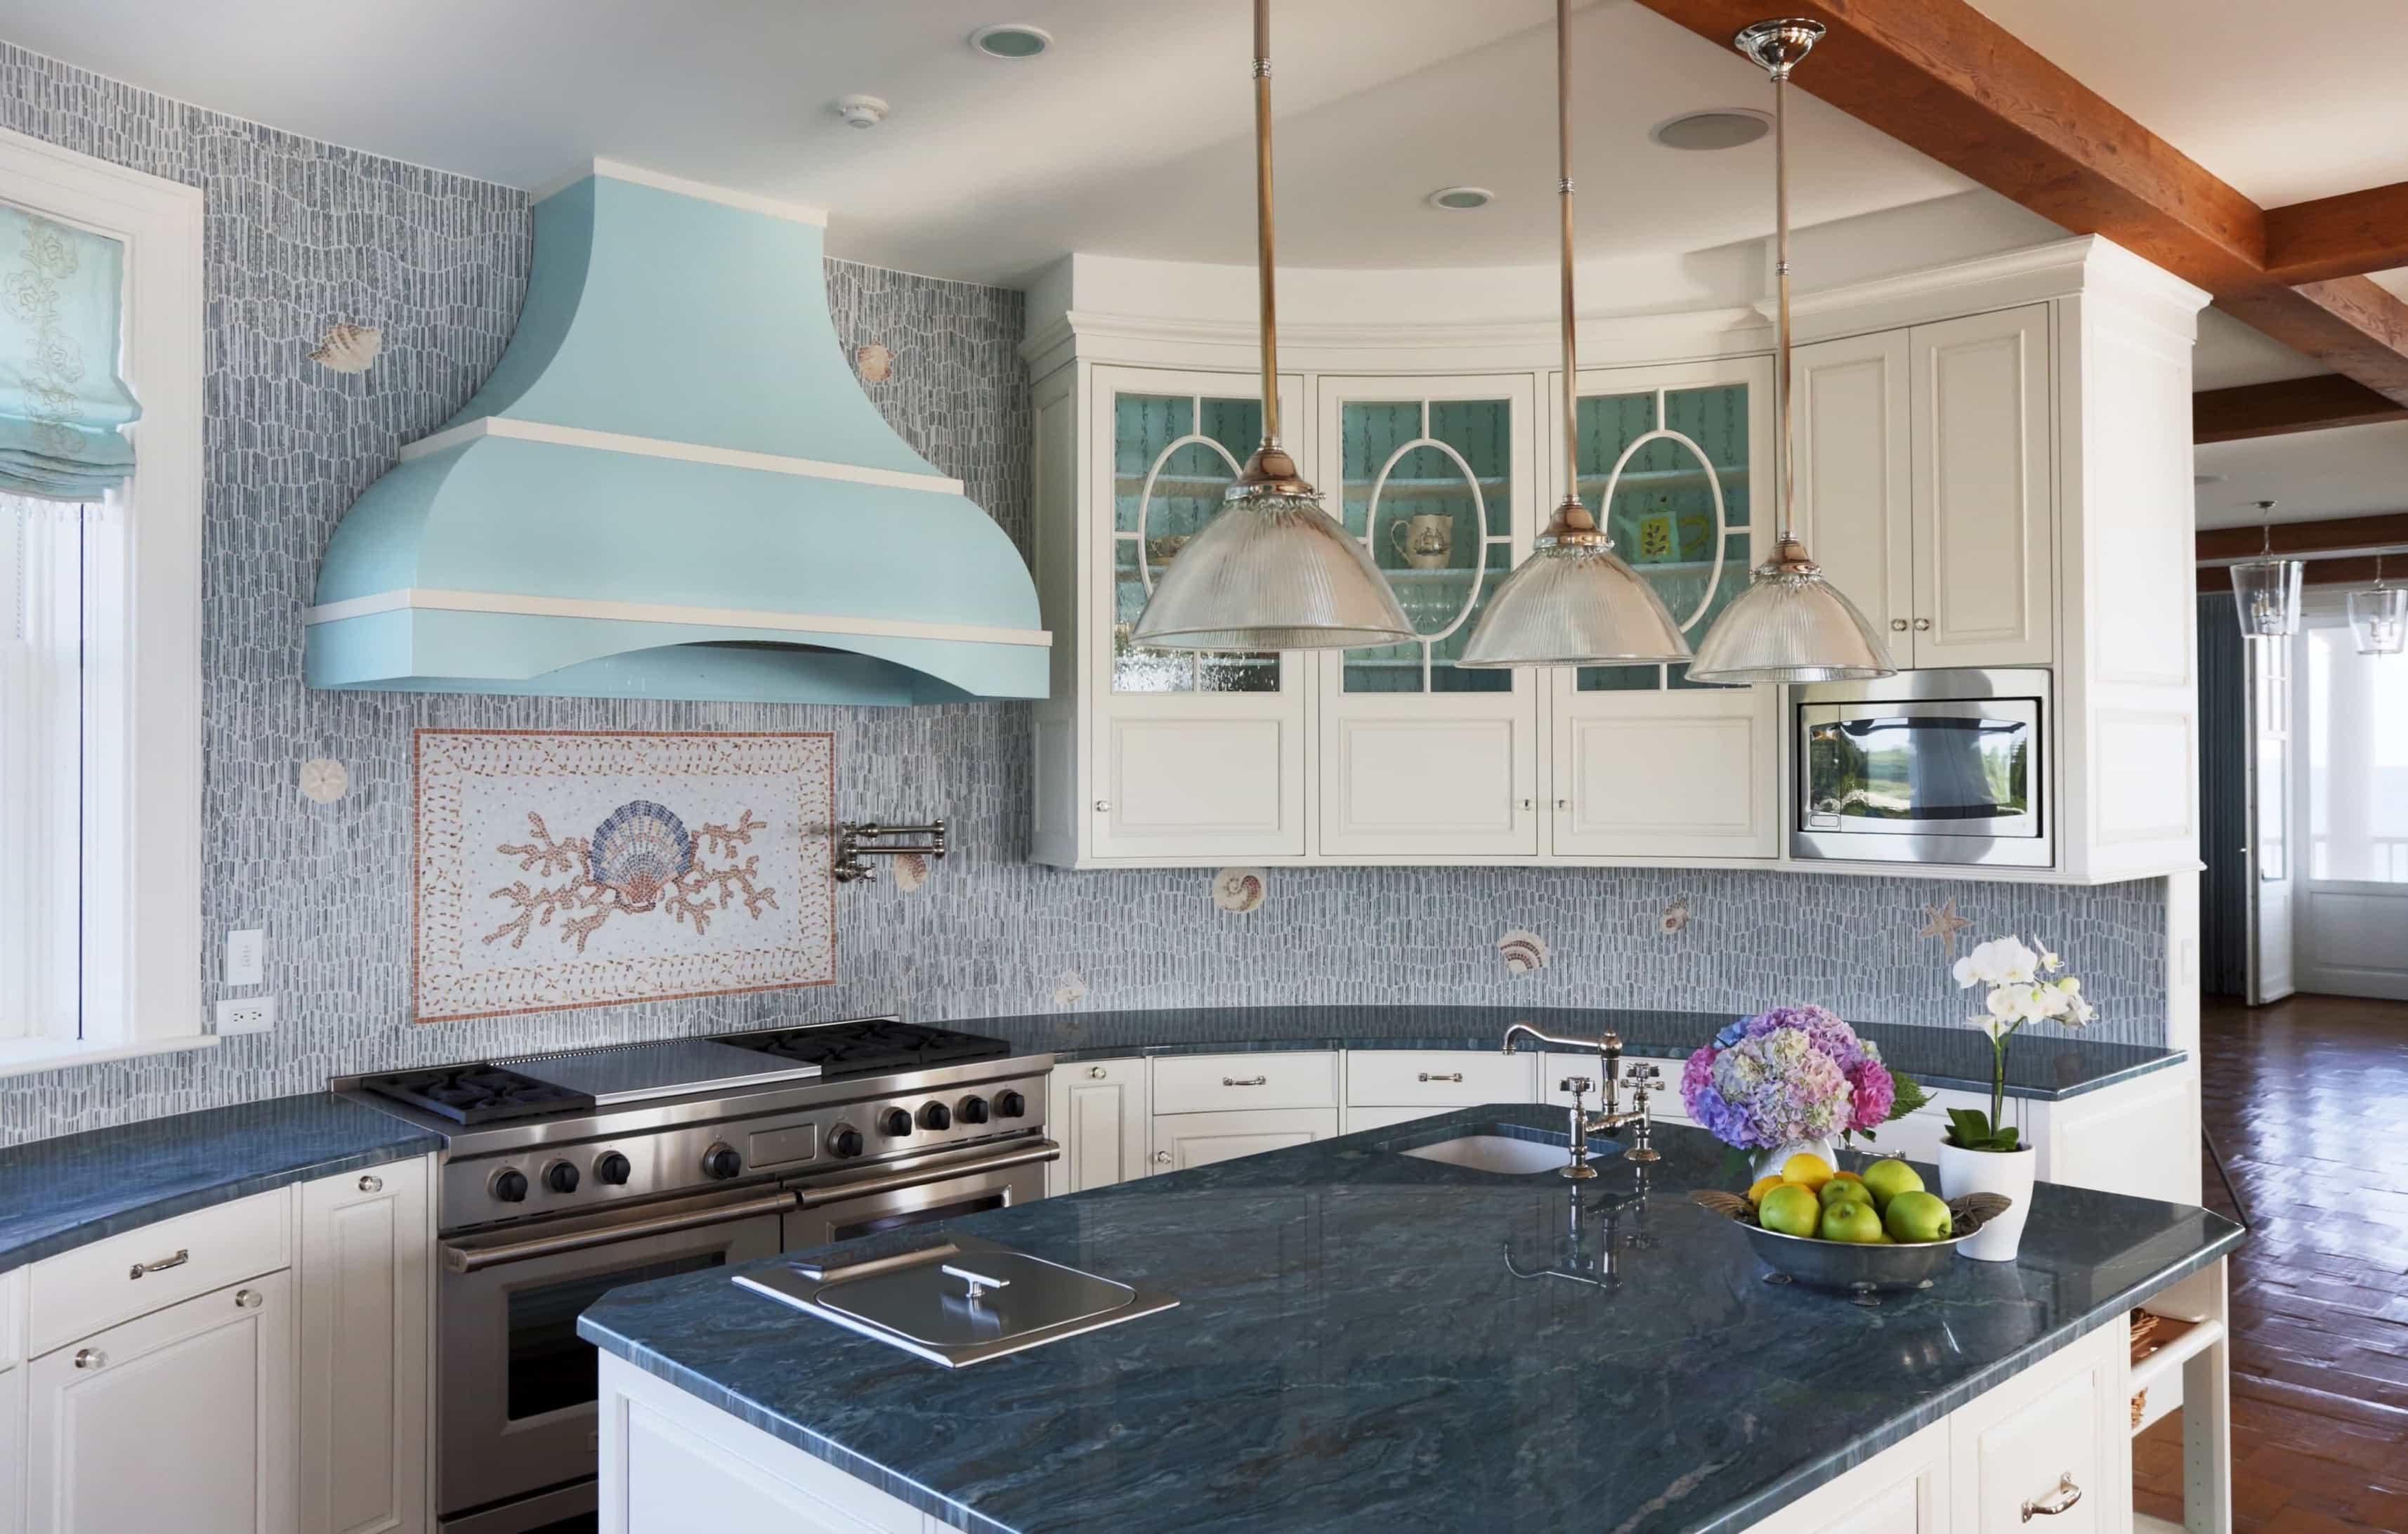 Featured Image of Coastal Kitchen Backsplash In The Chef Kitchen